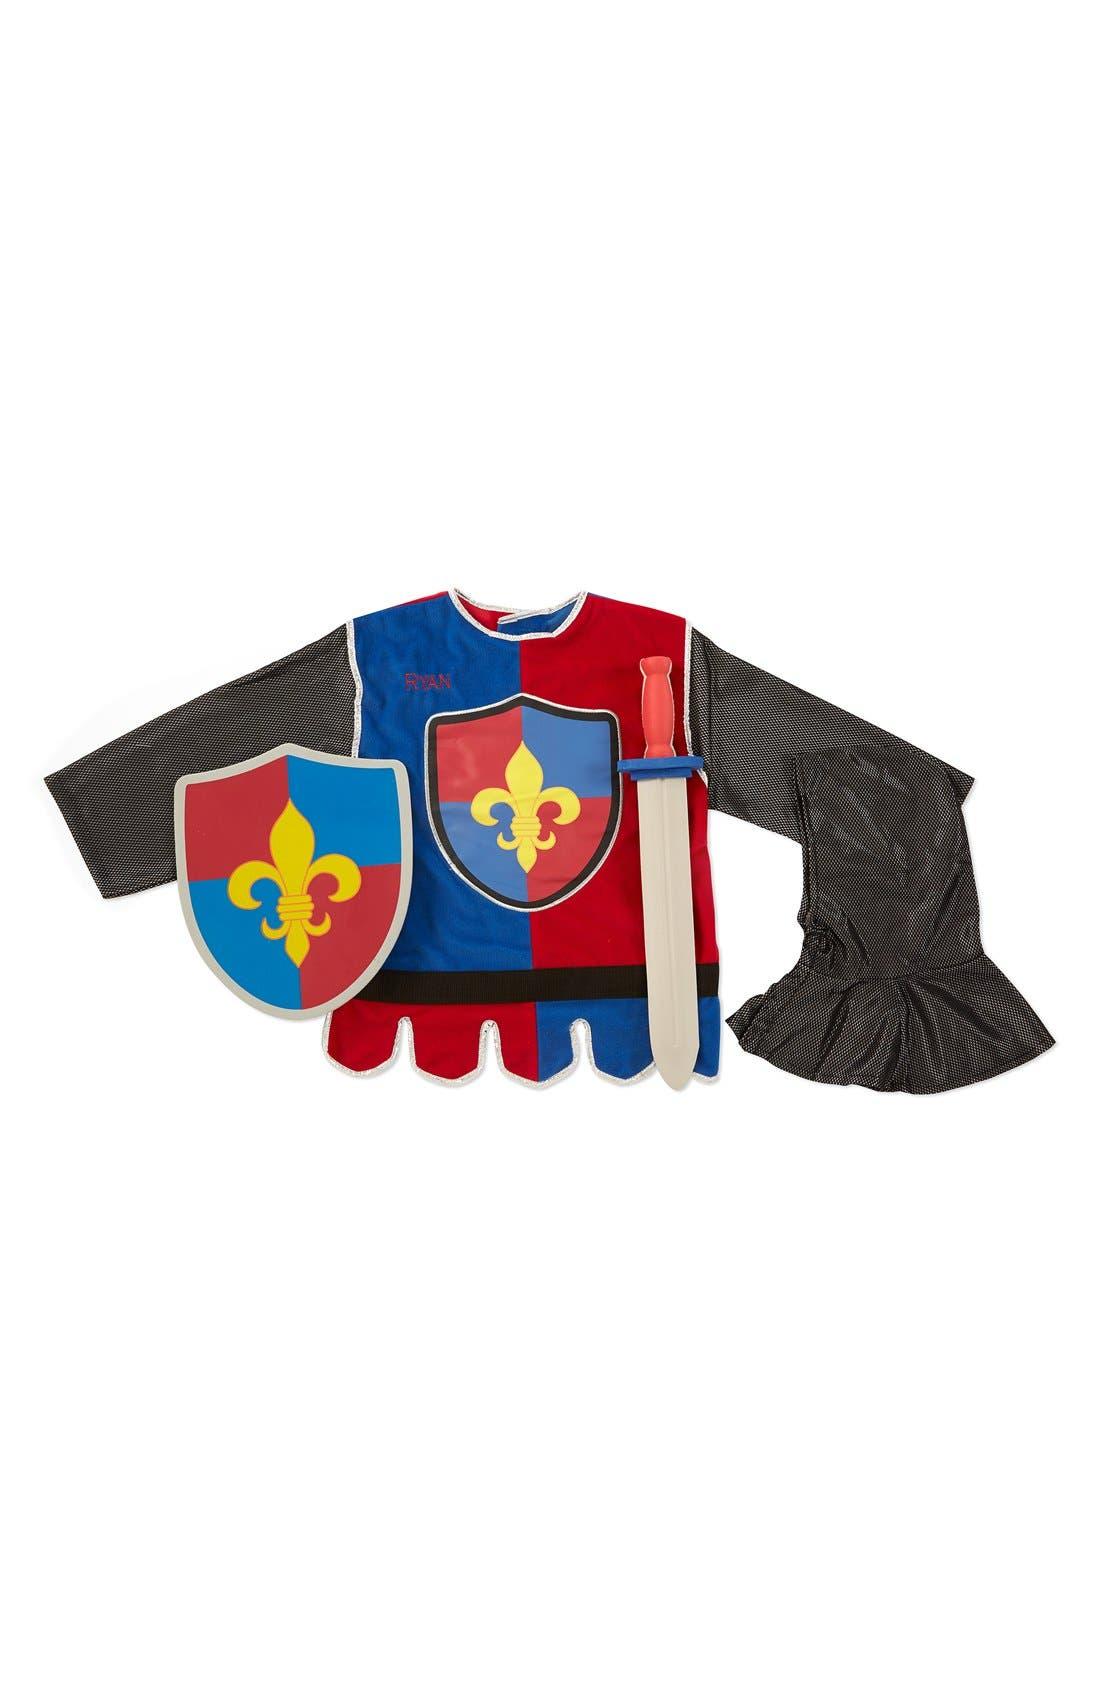 Melissa & Doug 'Knight' Personalized Costume Set (Toddler)